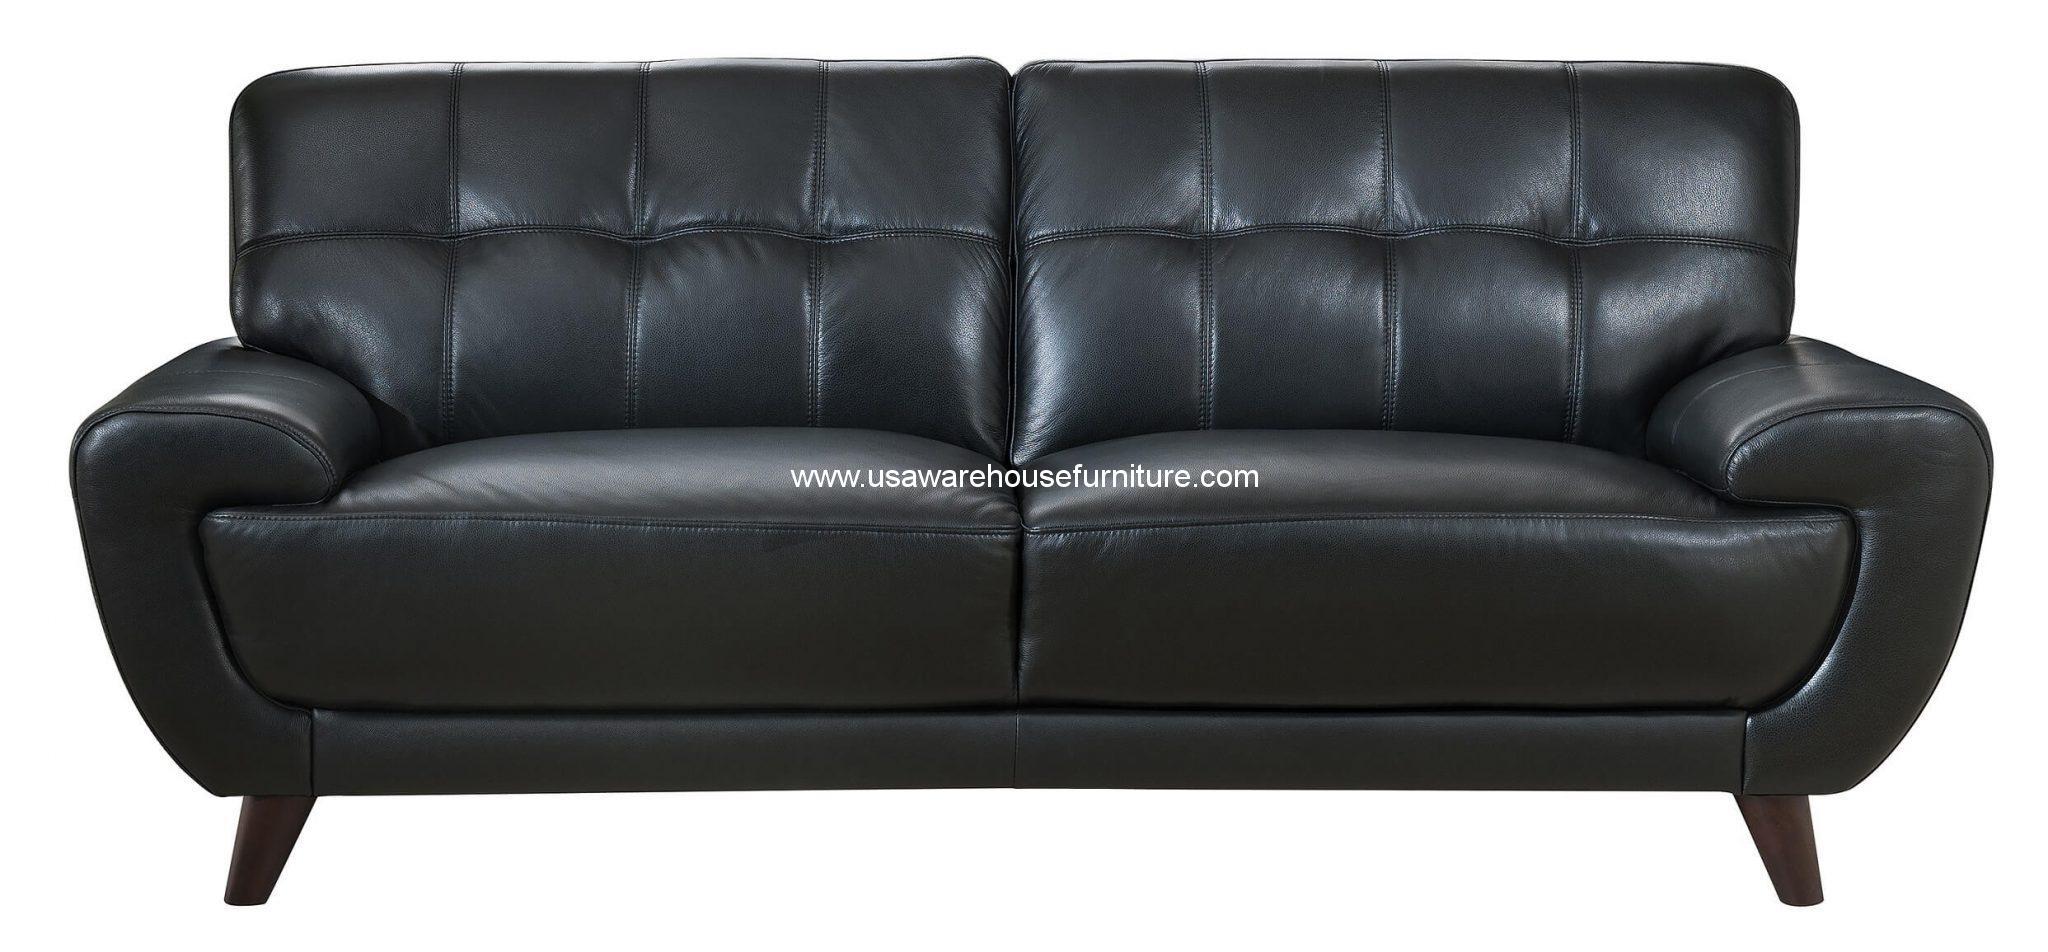 Nicole Black Full Top Grain Leather Sofa Usa Warehouse